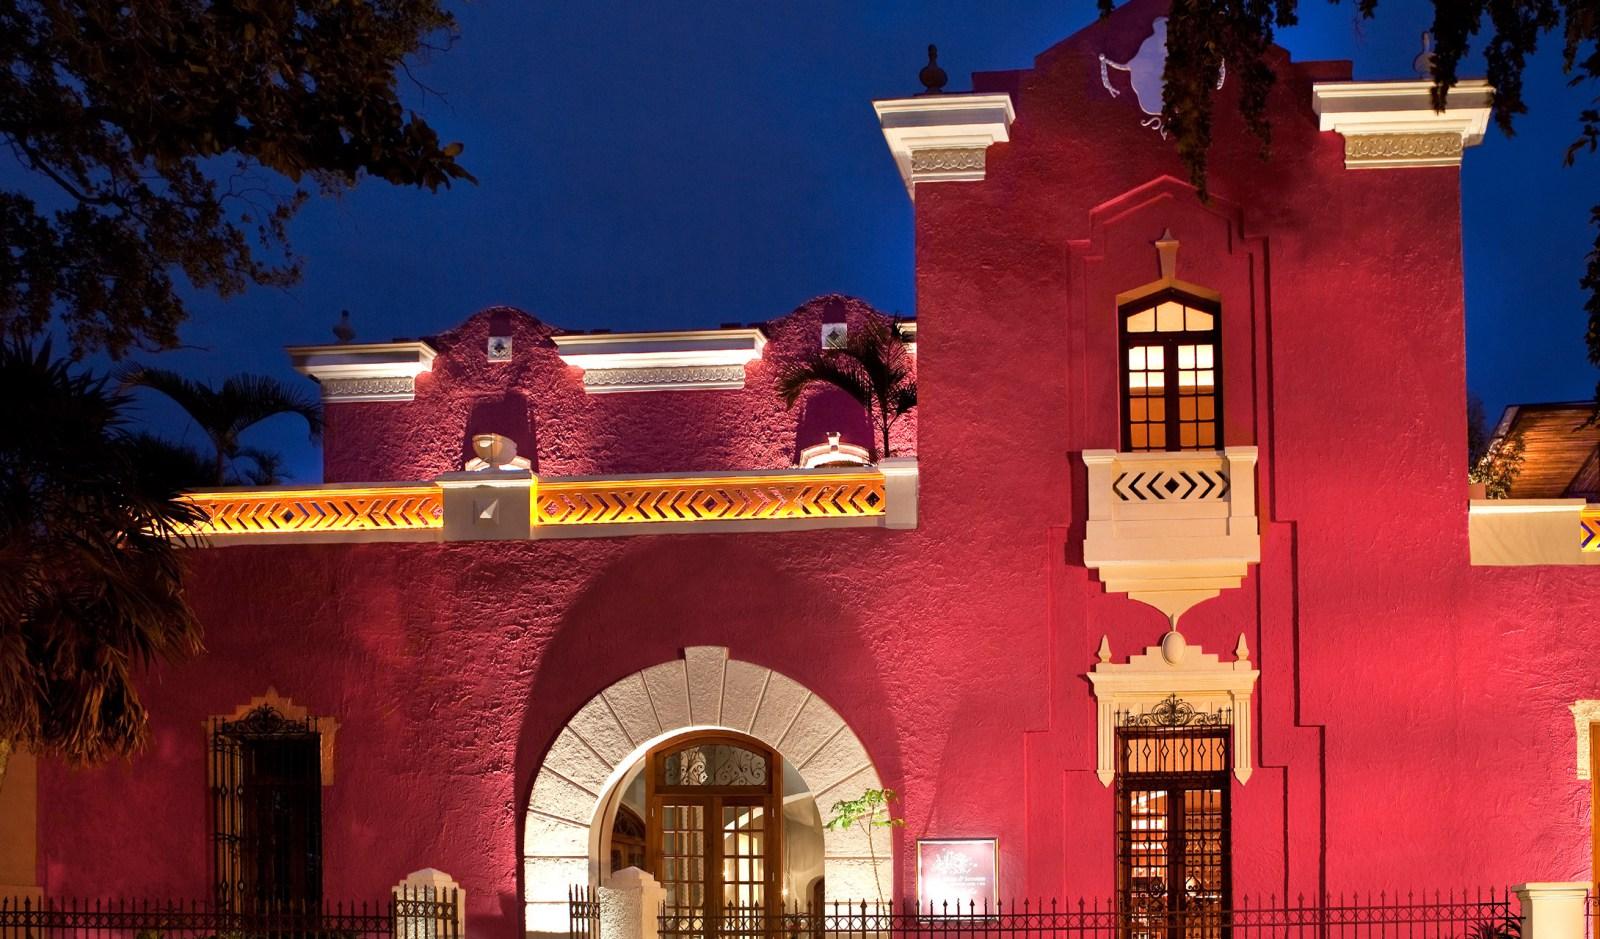 rosas-y-xocolate-architecture-m-02-r